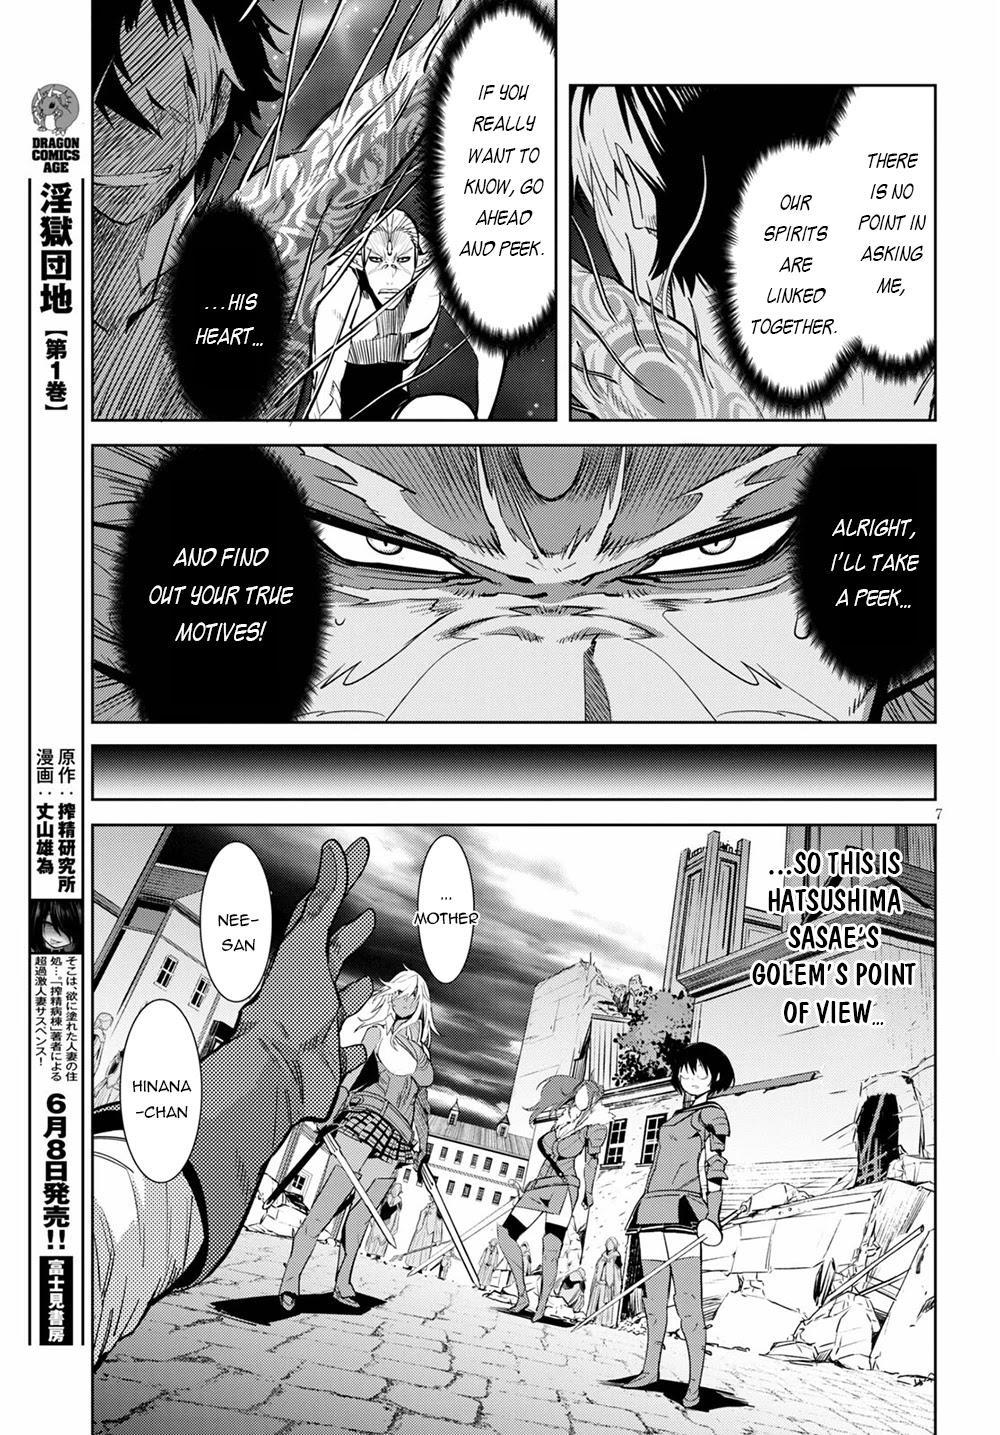 Game Obu Familia - Family Senki Chapter 33 page 8 - Mangakakalots.com